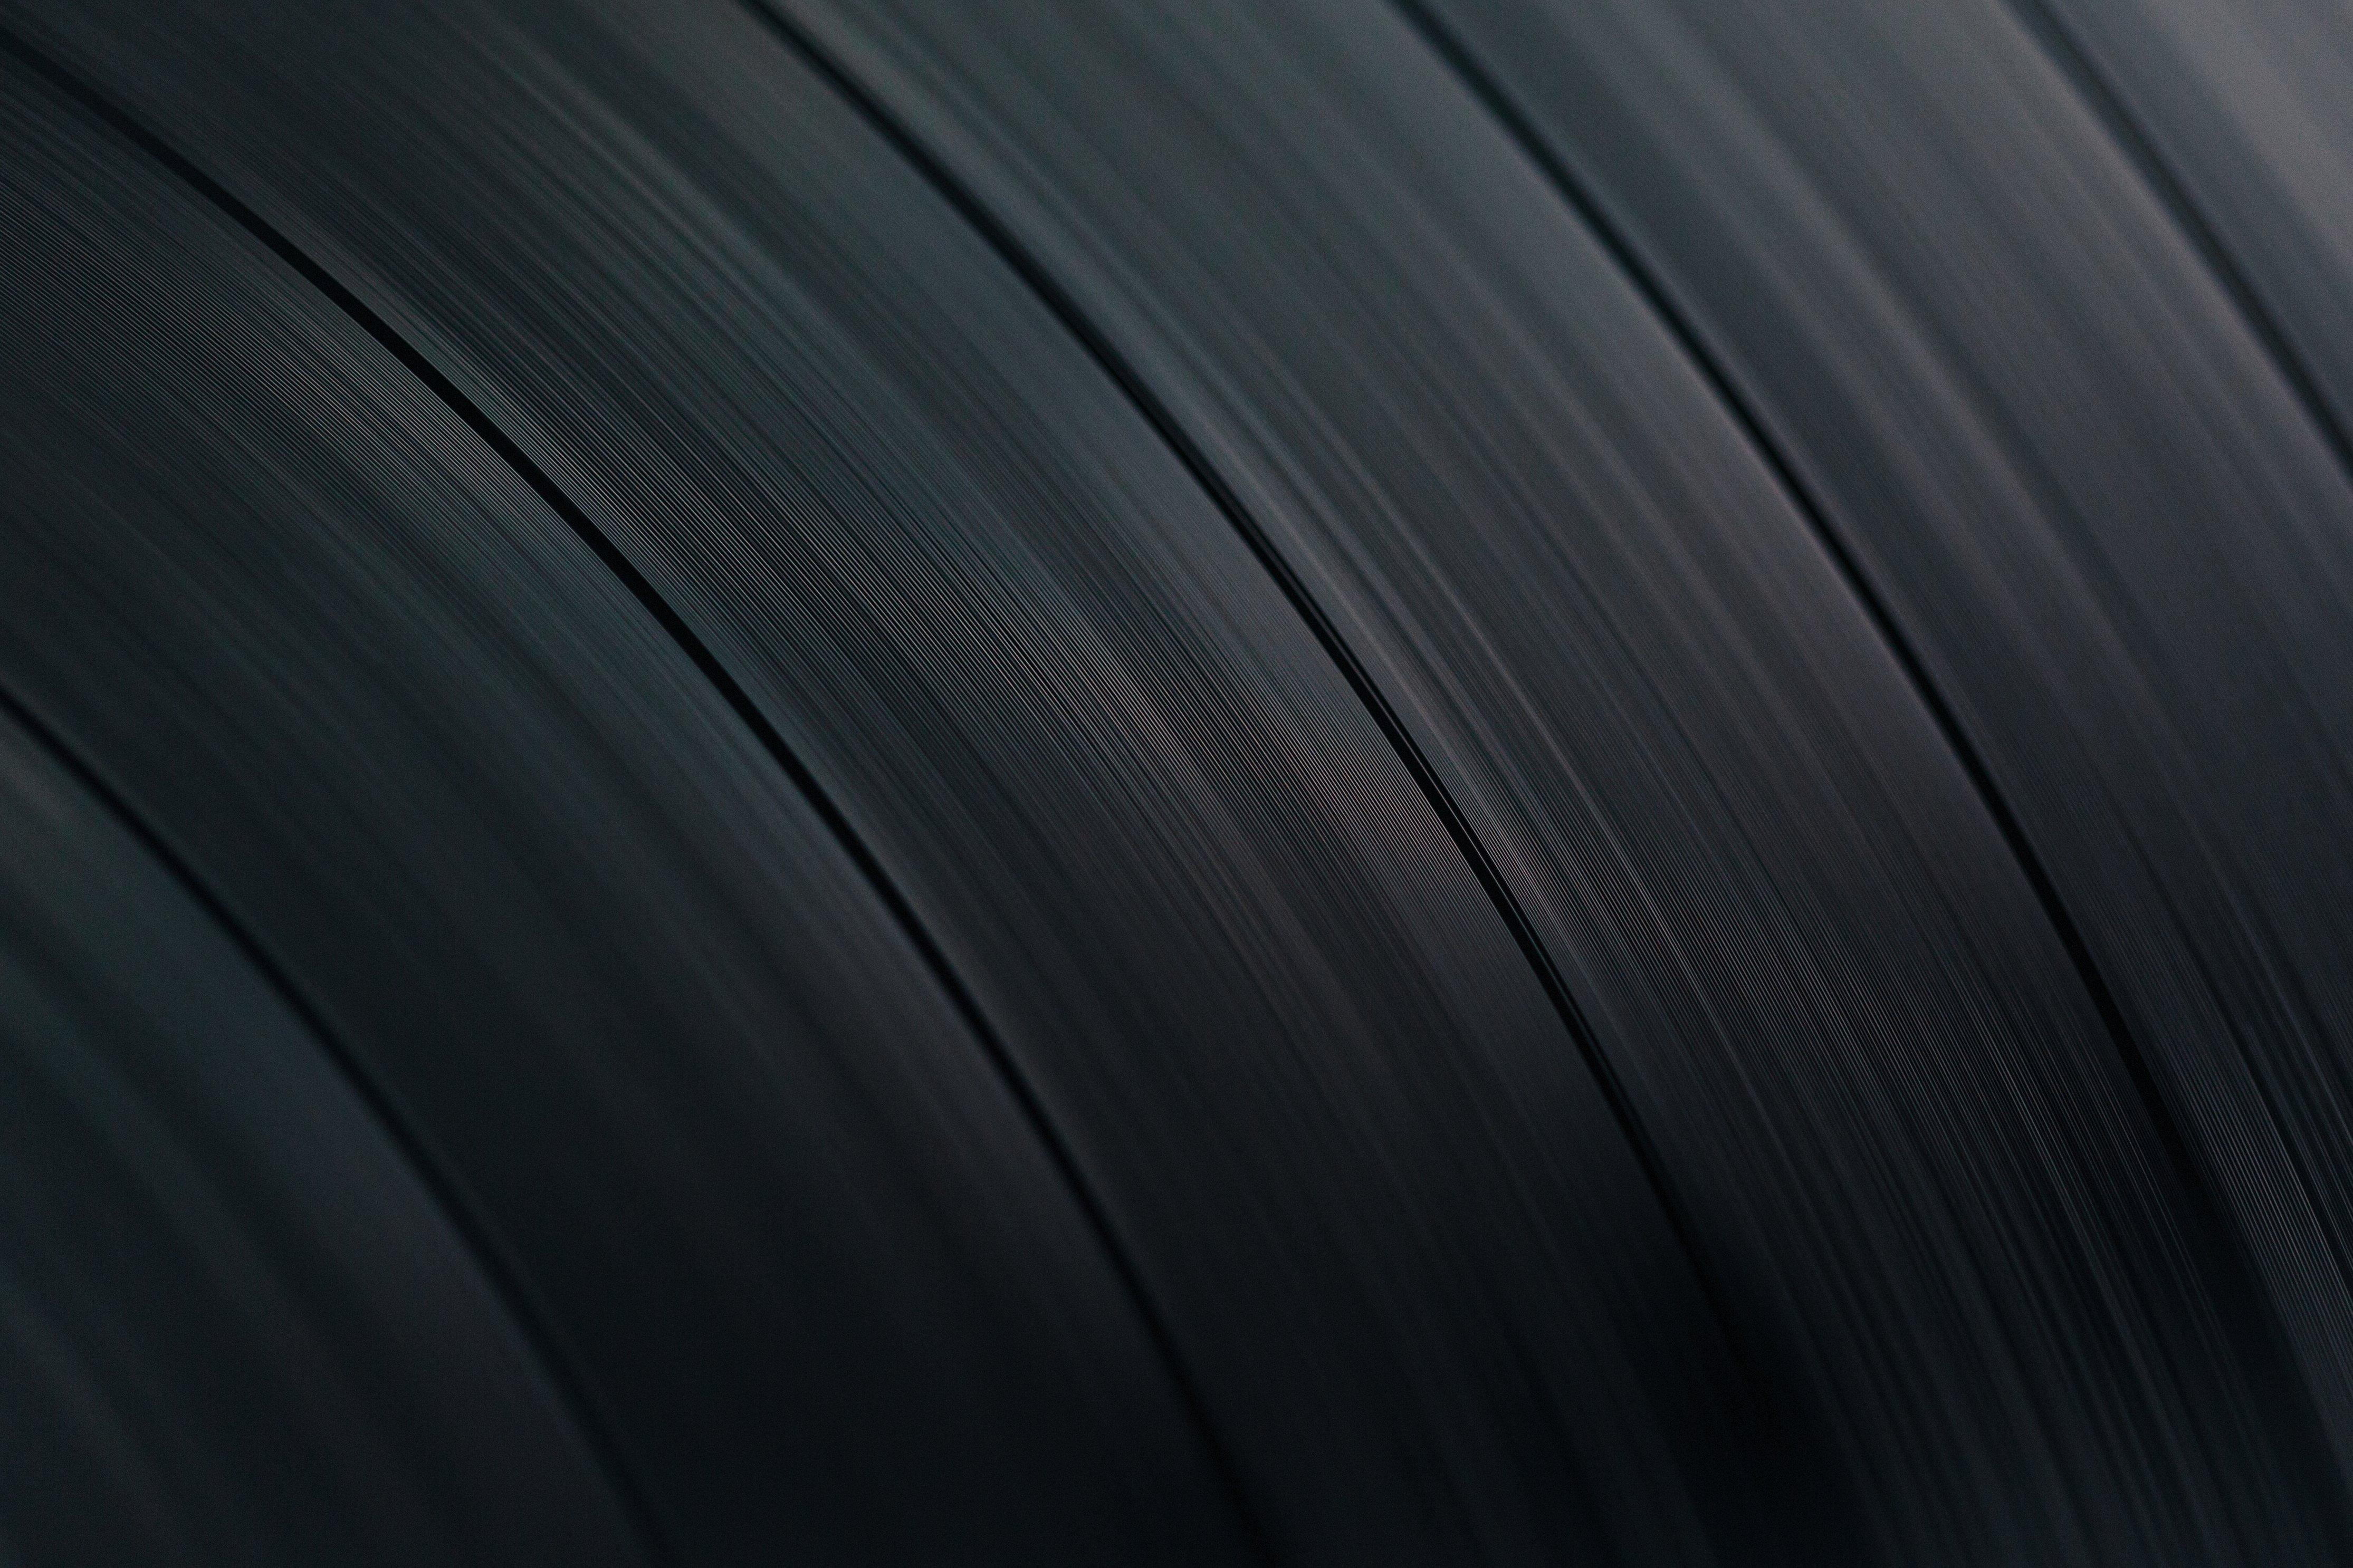 4000x3000 Vinyl Record Spinning 4000x3000 Resolution Hd 4k